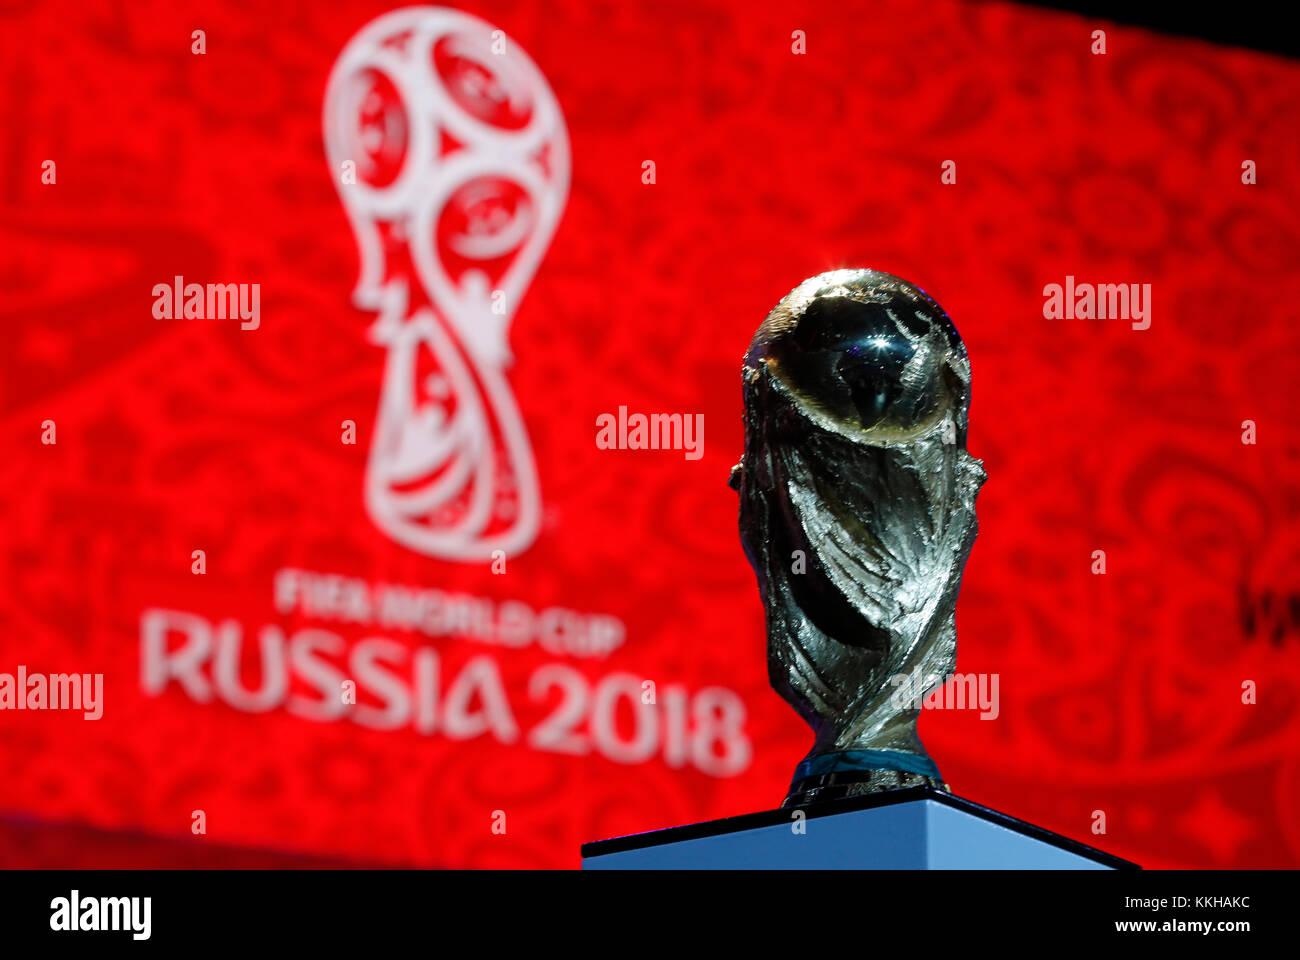 Moskau, Russland. 29th Nov, 2017. Der FIFA- Weltpokal/Trophaee, Trophy vor dem Logo der WM 2018. Fussball: Auslosung zur FIFA- Fussball Weltmeisterschaft 2018 in Moskau, Russland 01.12.2017 - Football, Draw for the FIFA- World Cup 2018, Moscow, December 01, 2017 |usage worldwide Credit: dpa/Alamy Live News Stock Photo